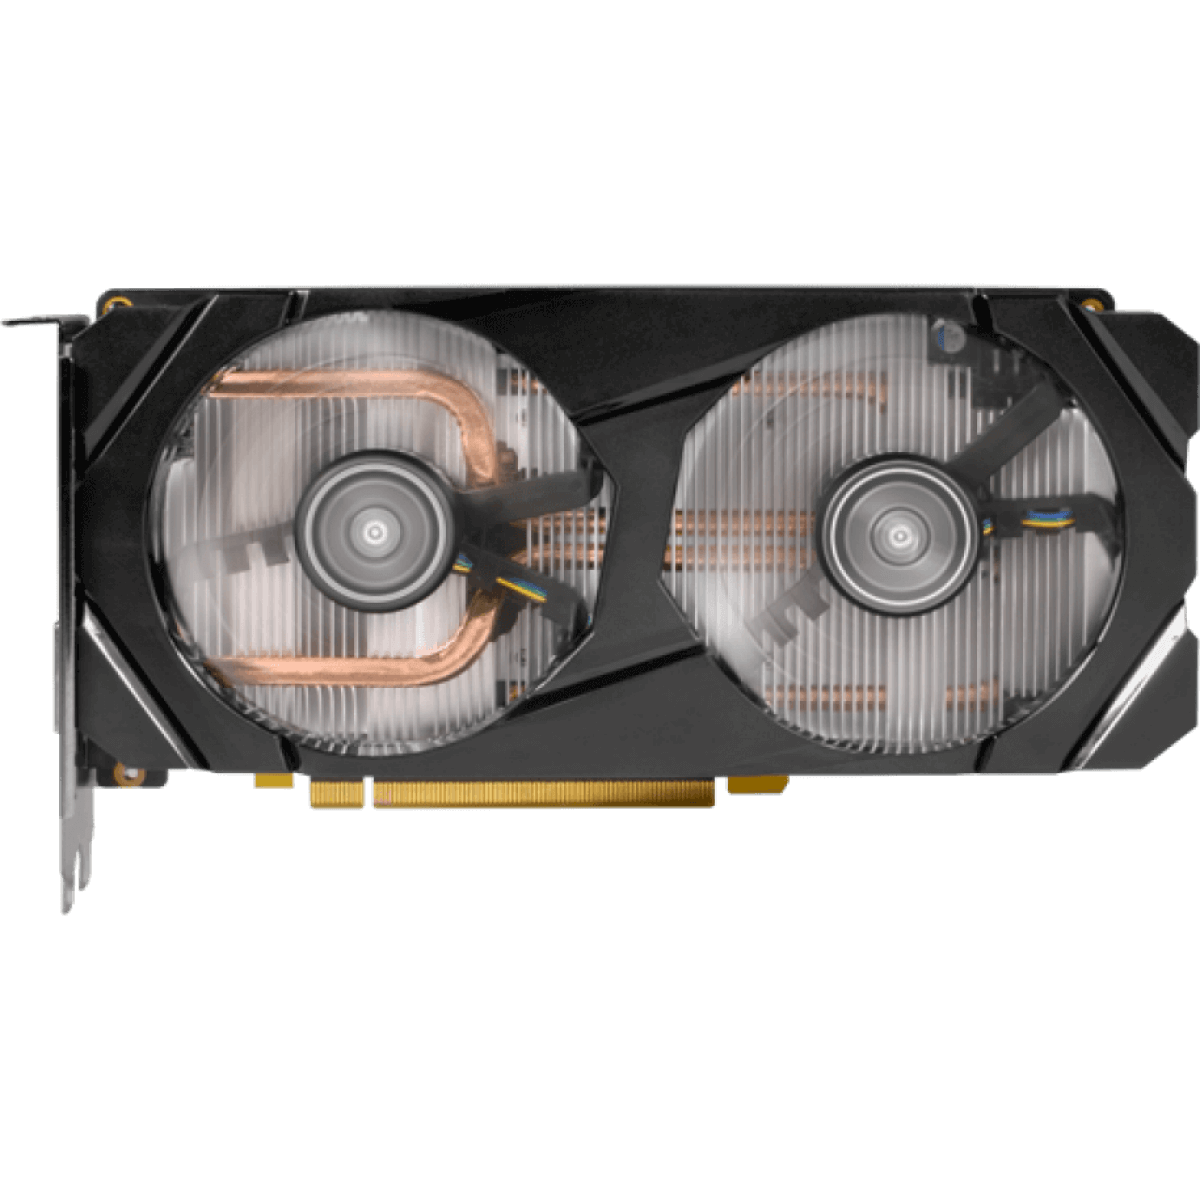 Placa de vídeo Galax GeForce RTX 2060 OC 6GB GDDR6 26NRL7HPX7OC